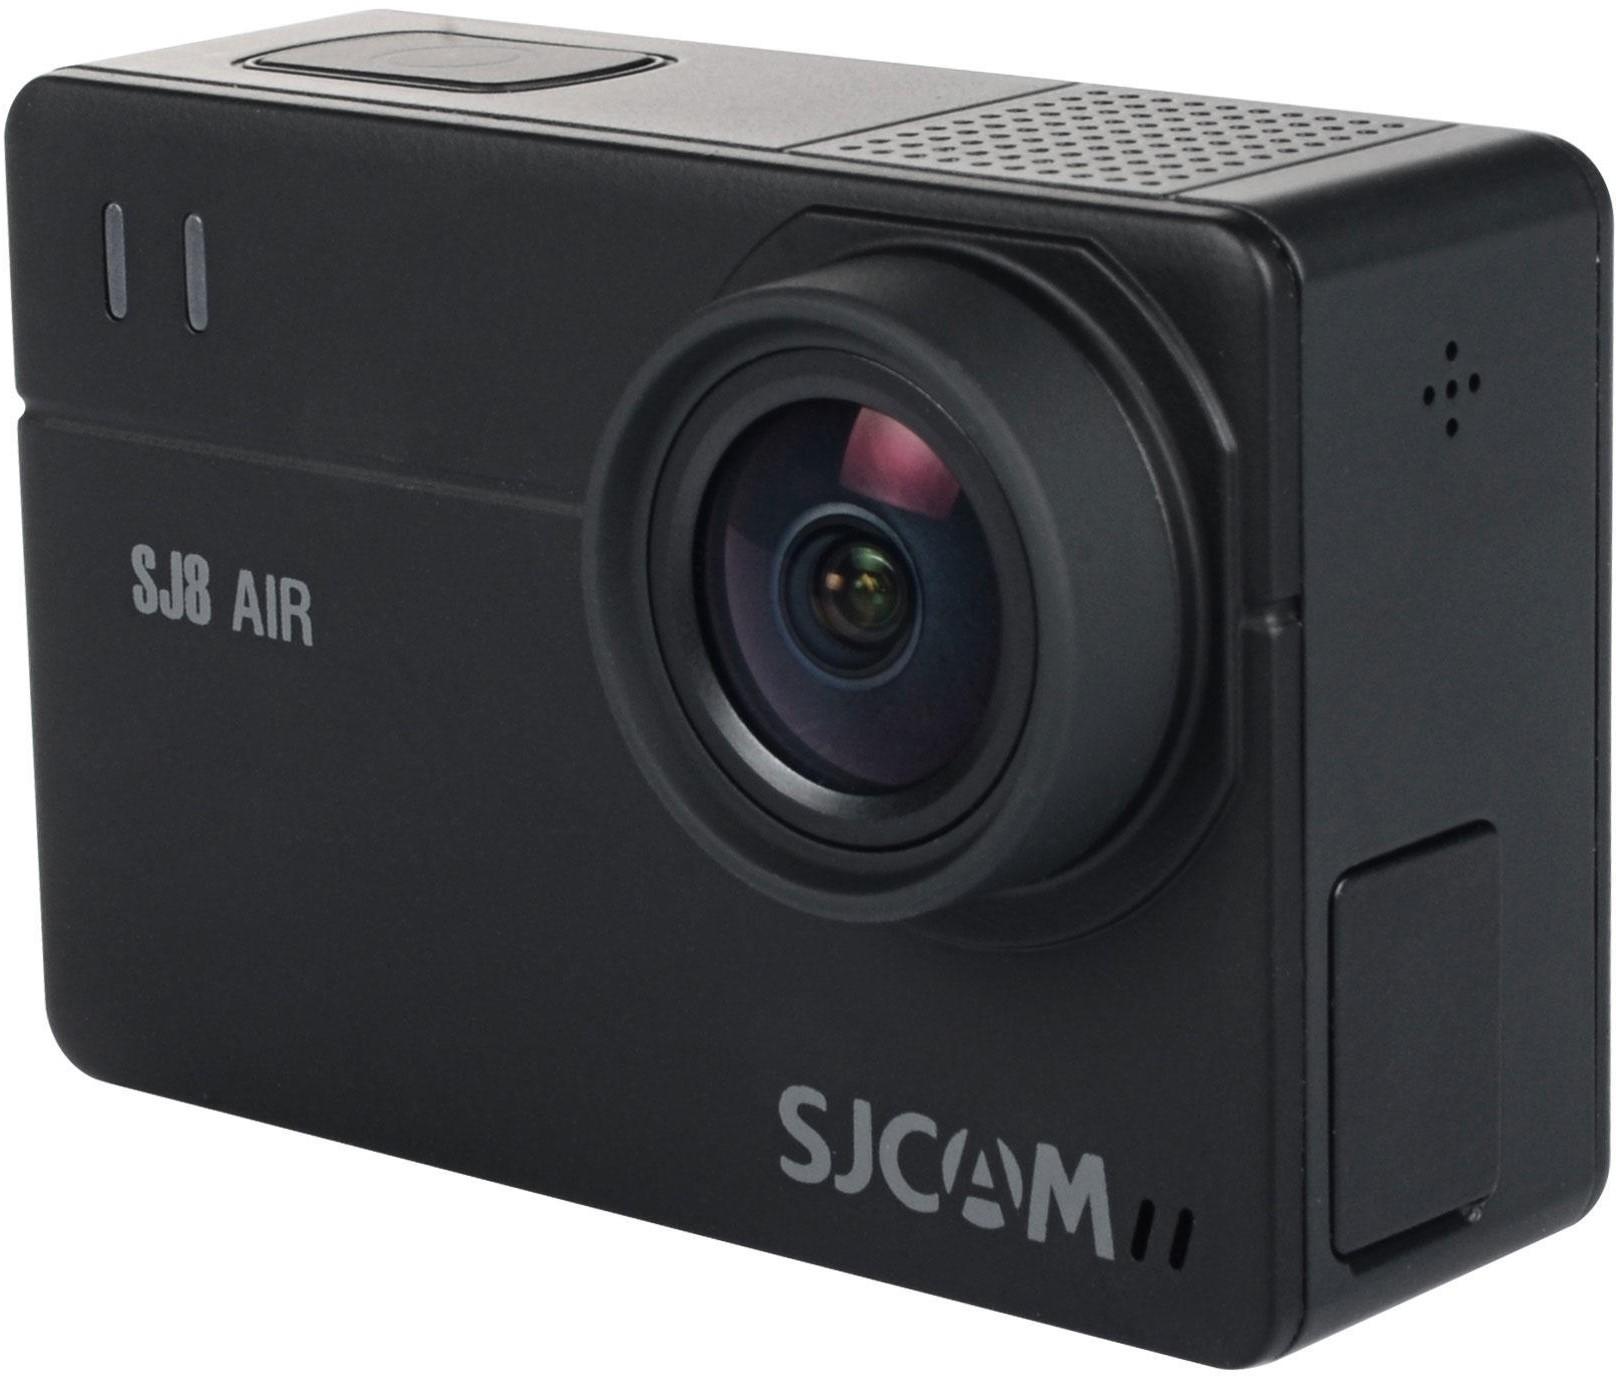 Экшен-камера Sjcam SJ8 Air Black